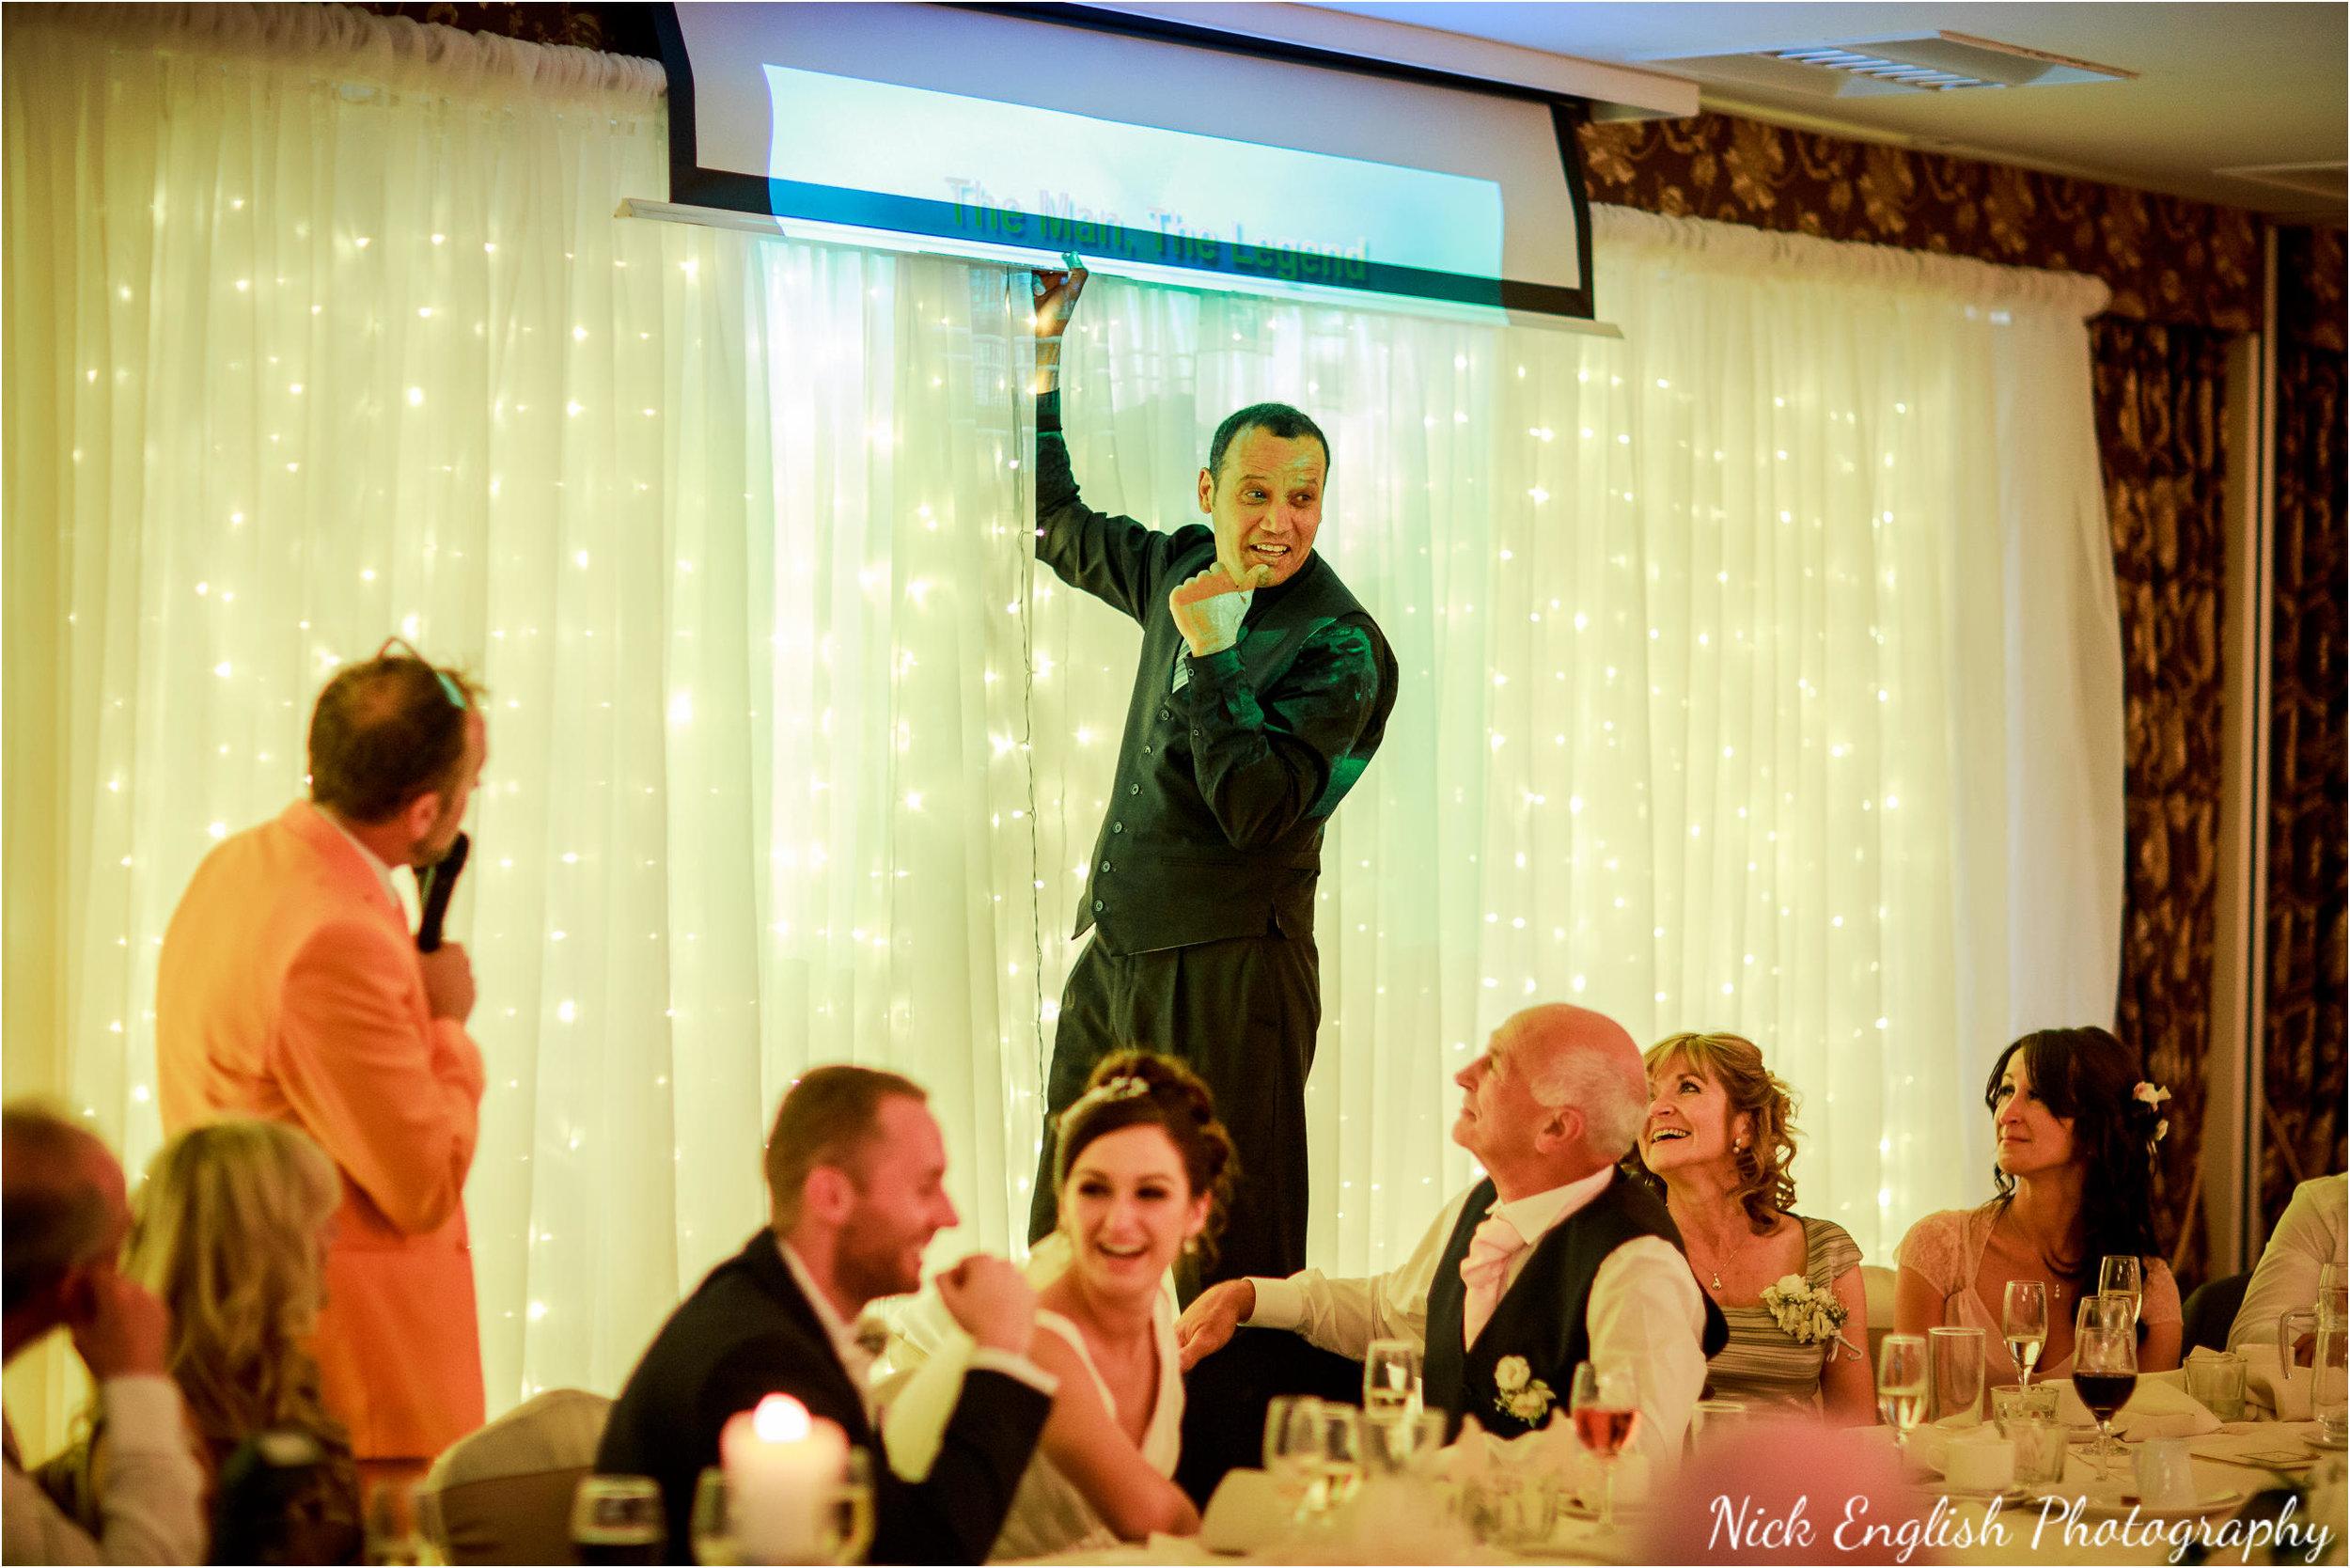 Emily David Wedding Photographs at Barton Grange Preston by Nick English Photography 178jpg.jpeg